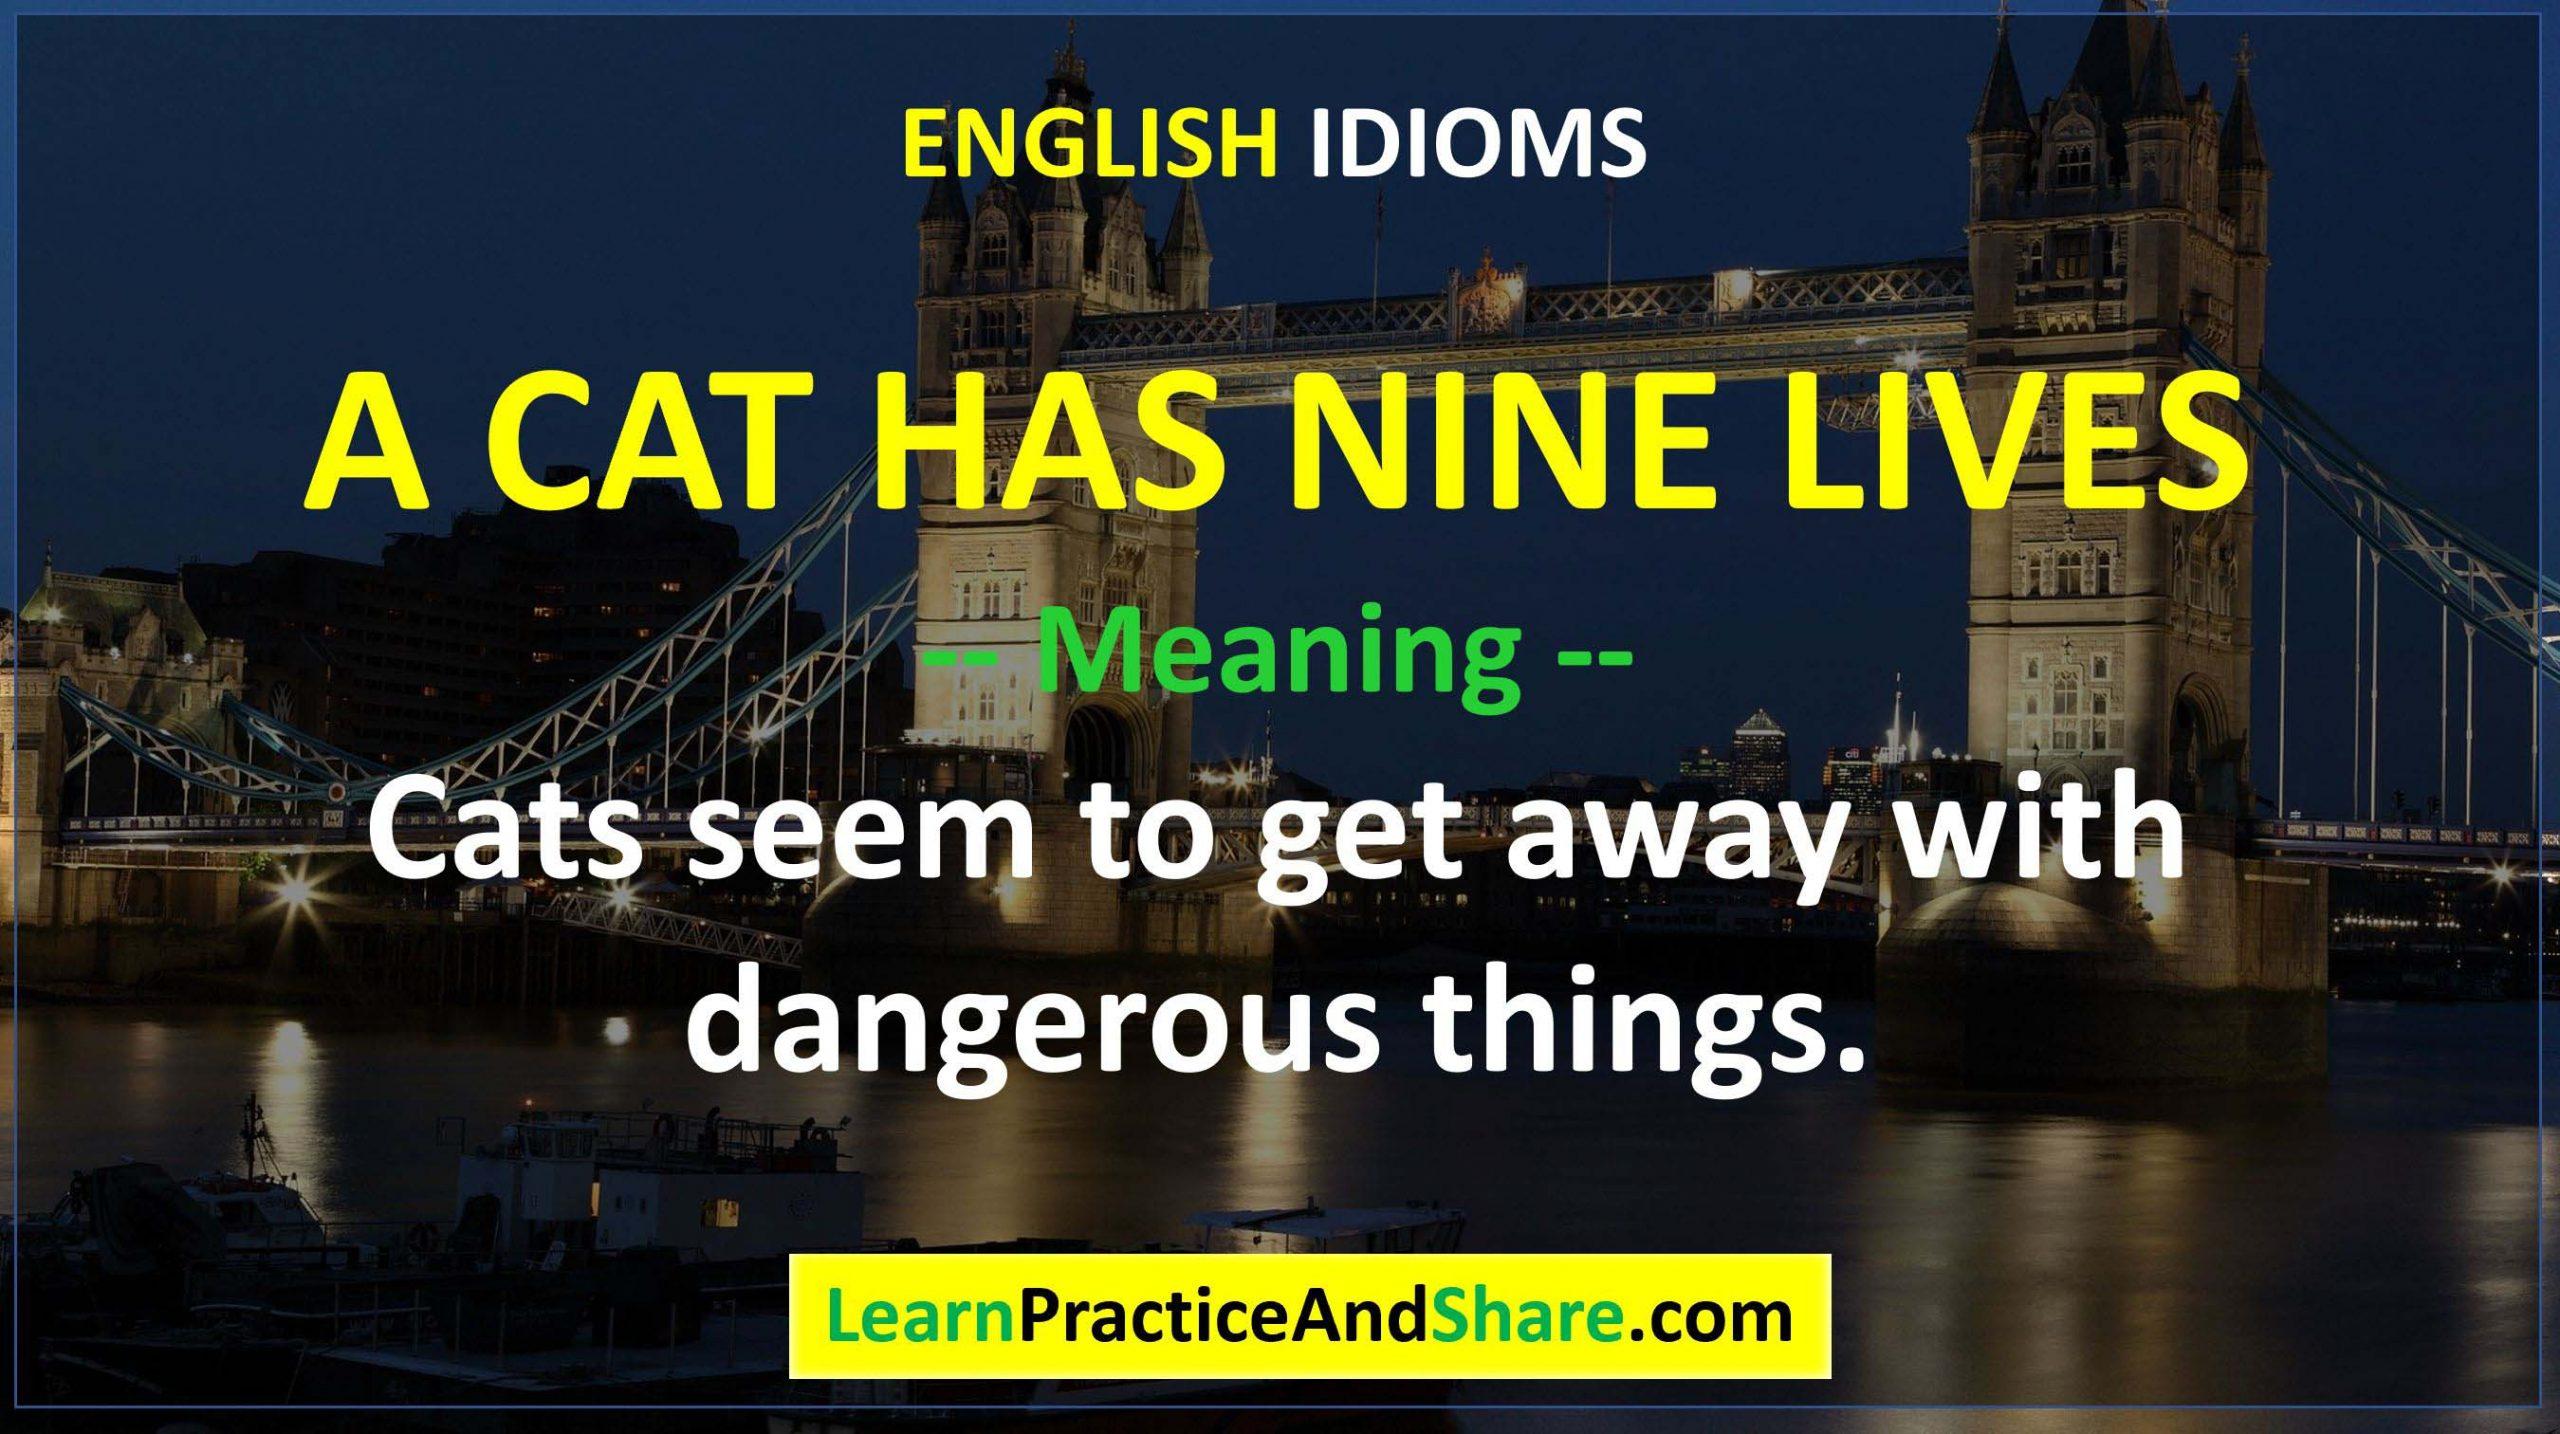 English Idiom - A Cat Has Nine Lives